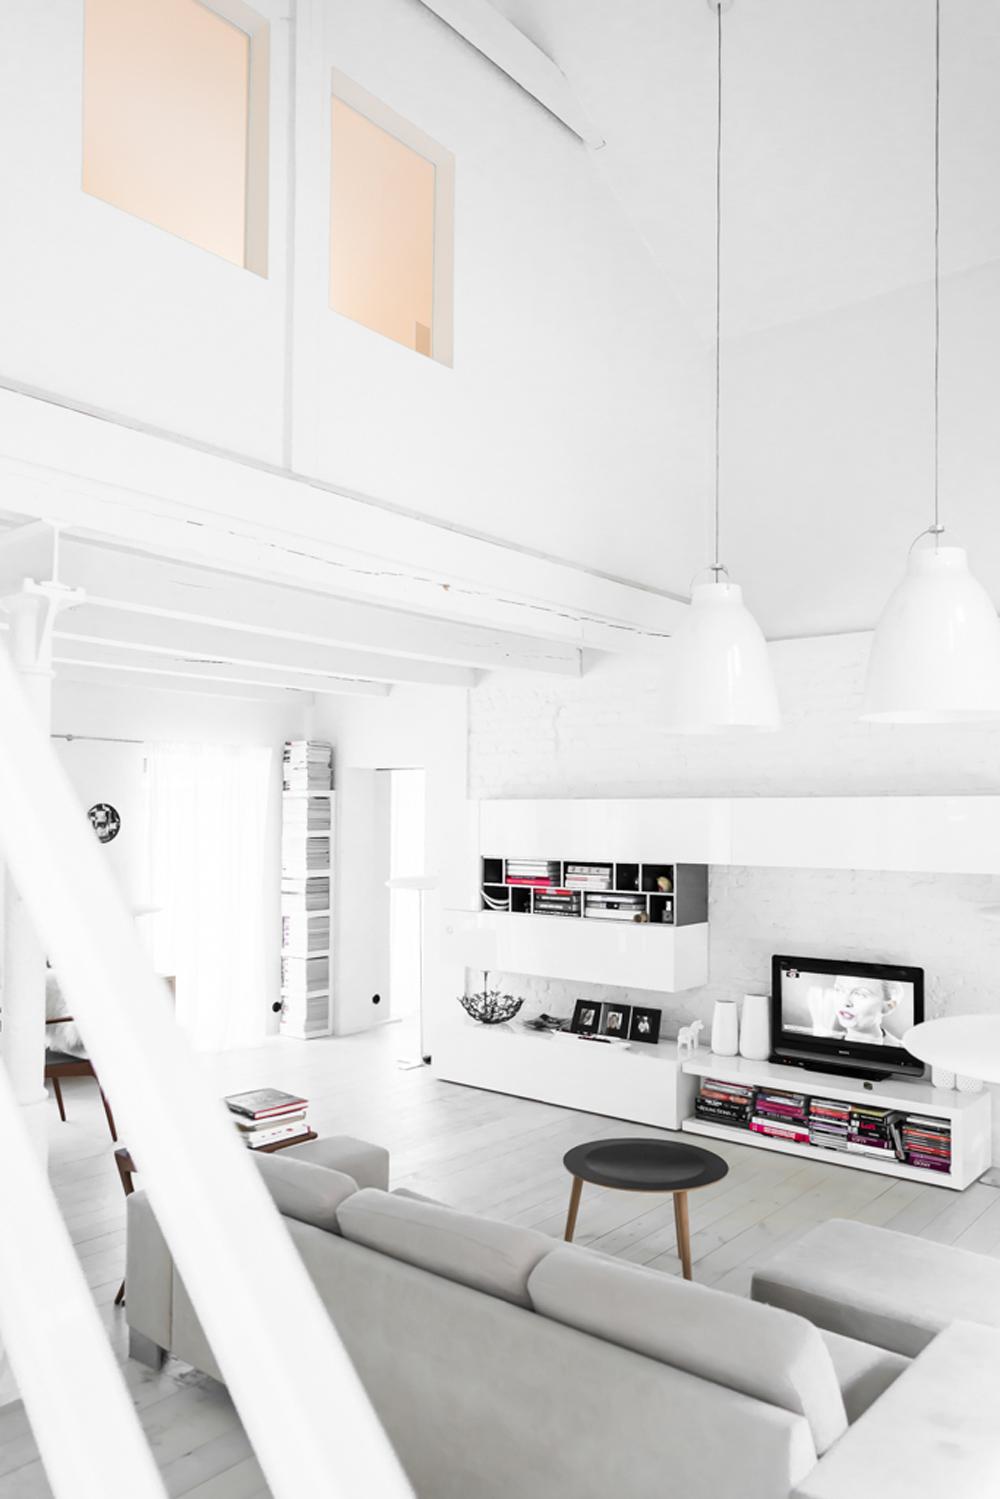 Oracle, Fox, Sunday, Sanctuary, Polish, Farmhouse, White, Minimalist, Interior, Indoor, Plants, Scandinavian, Style, Living, Danish, Furniture, Living Room